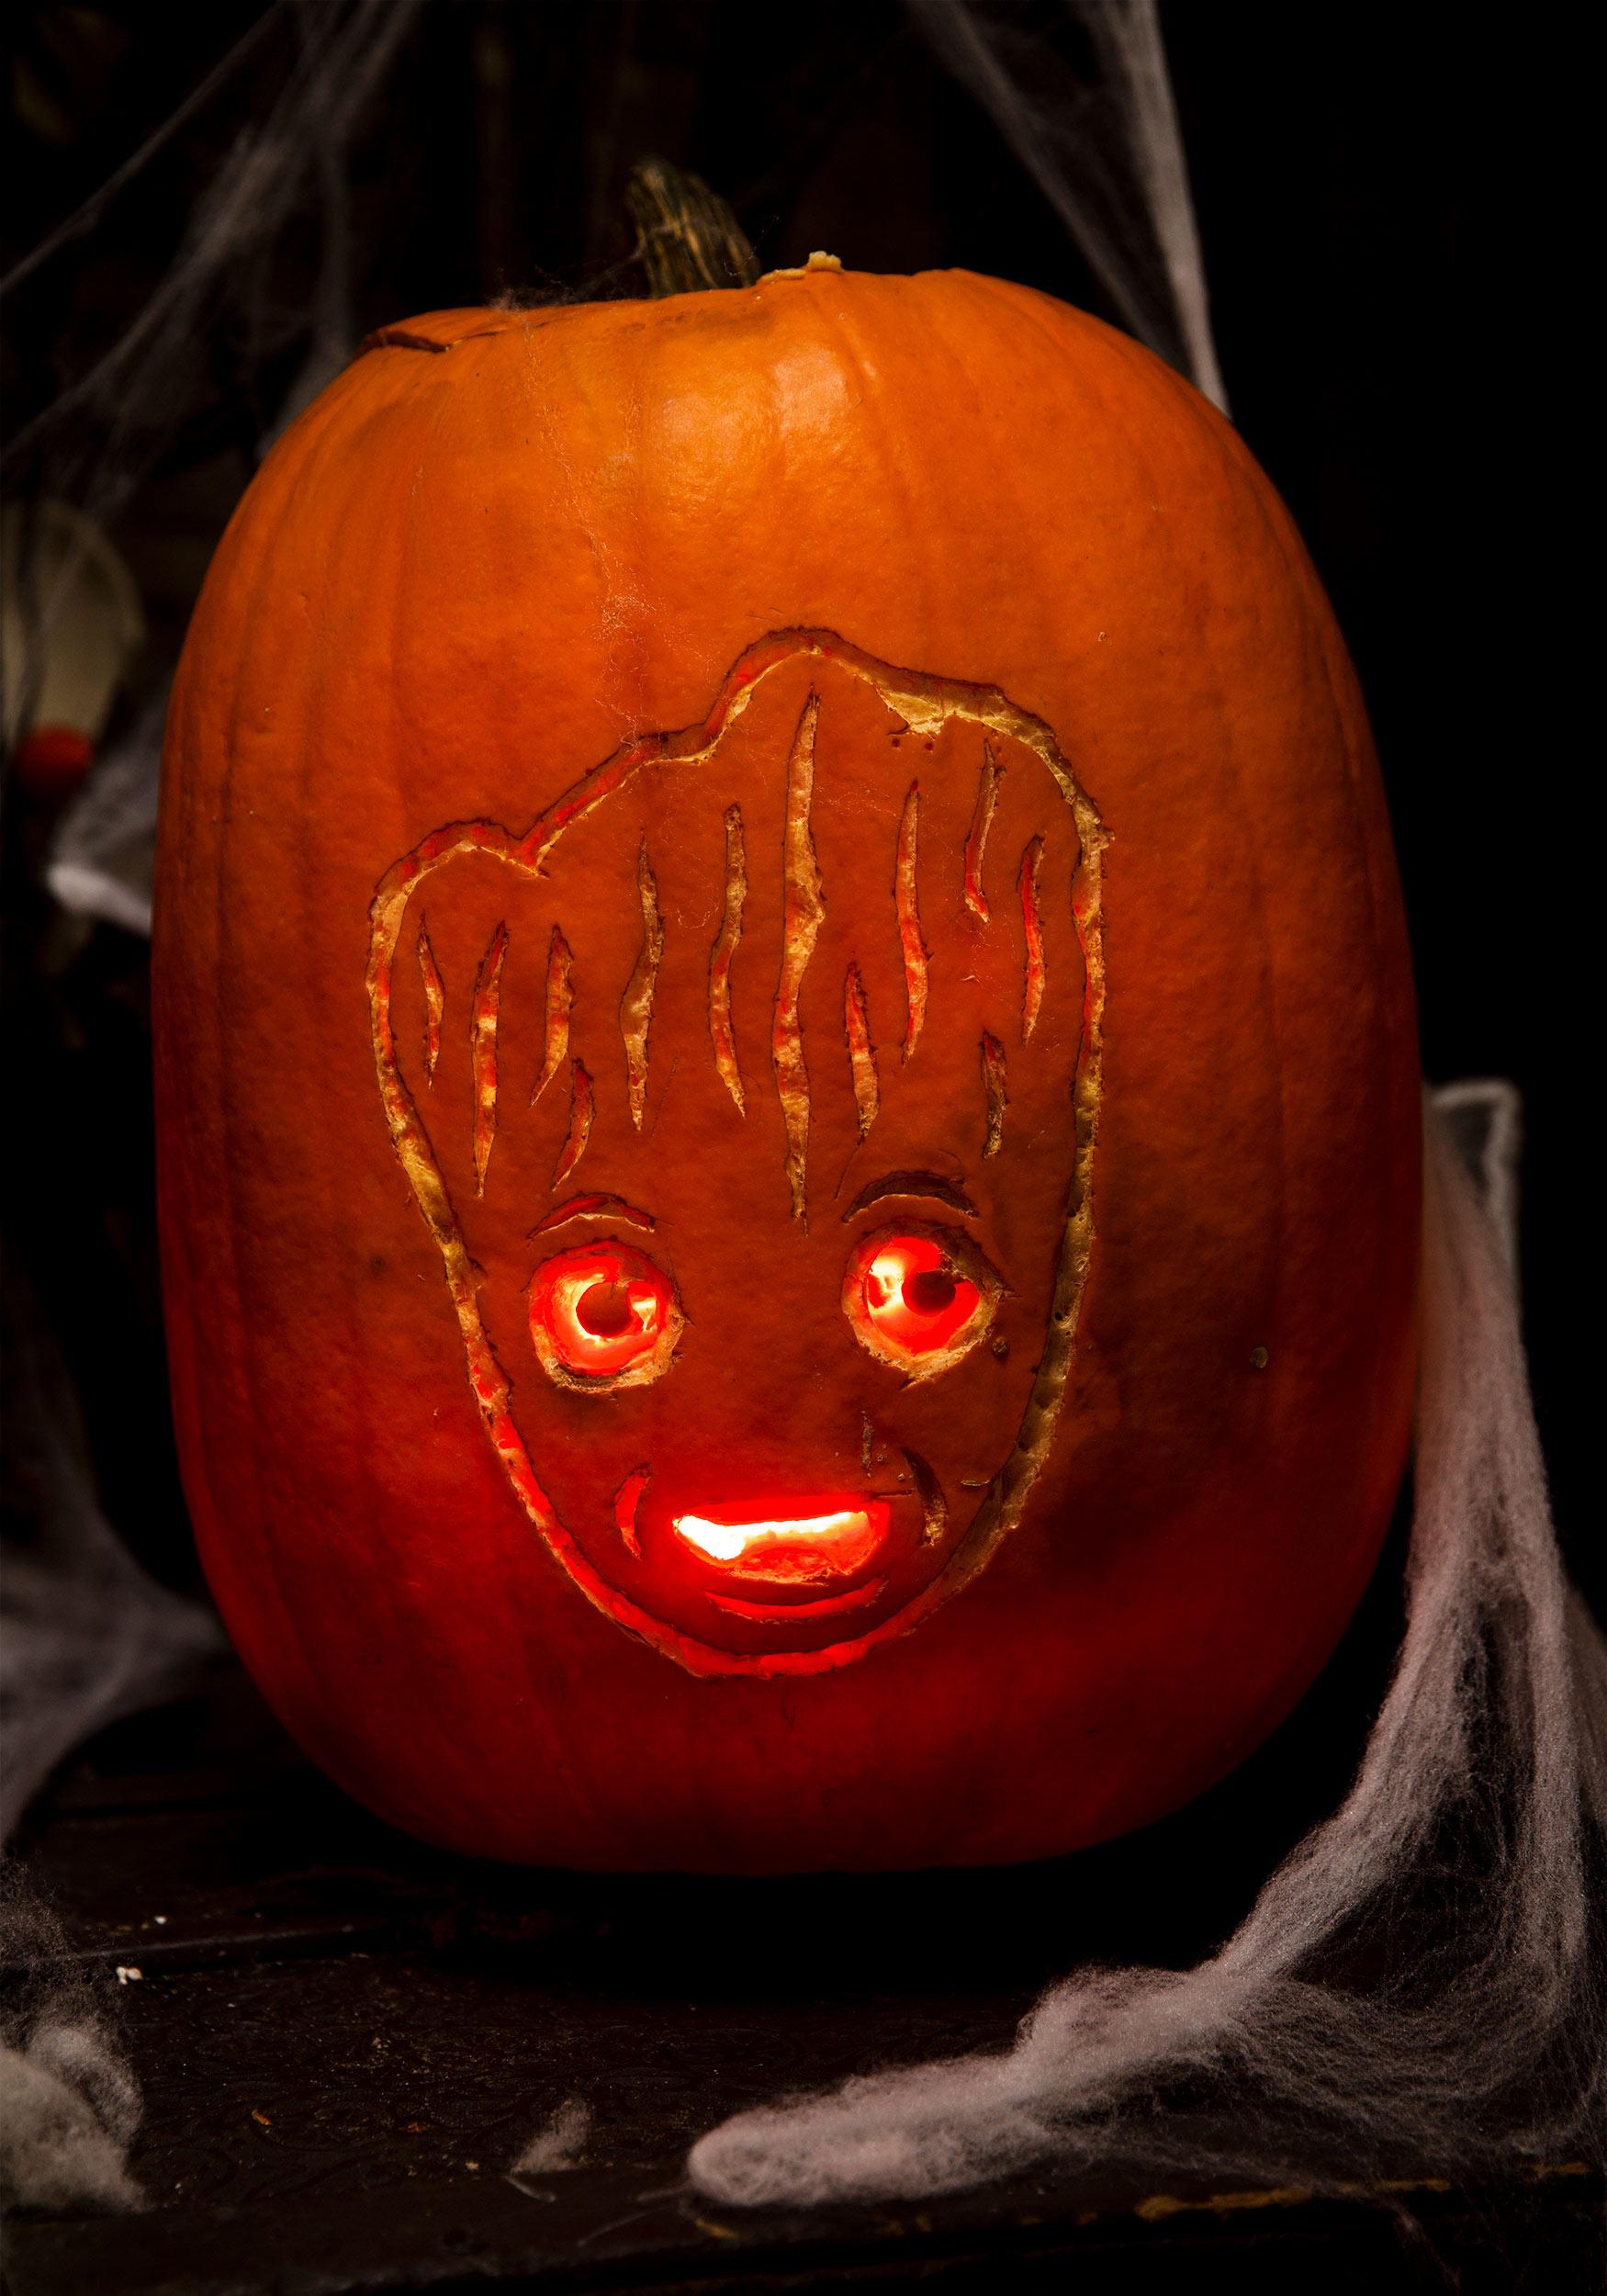 pumpkin template groot  Pop Culture Pumpkins: Free Stencils for All Ages [Printables ...